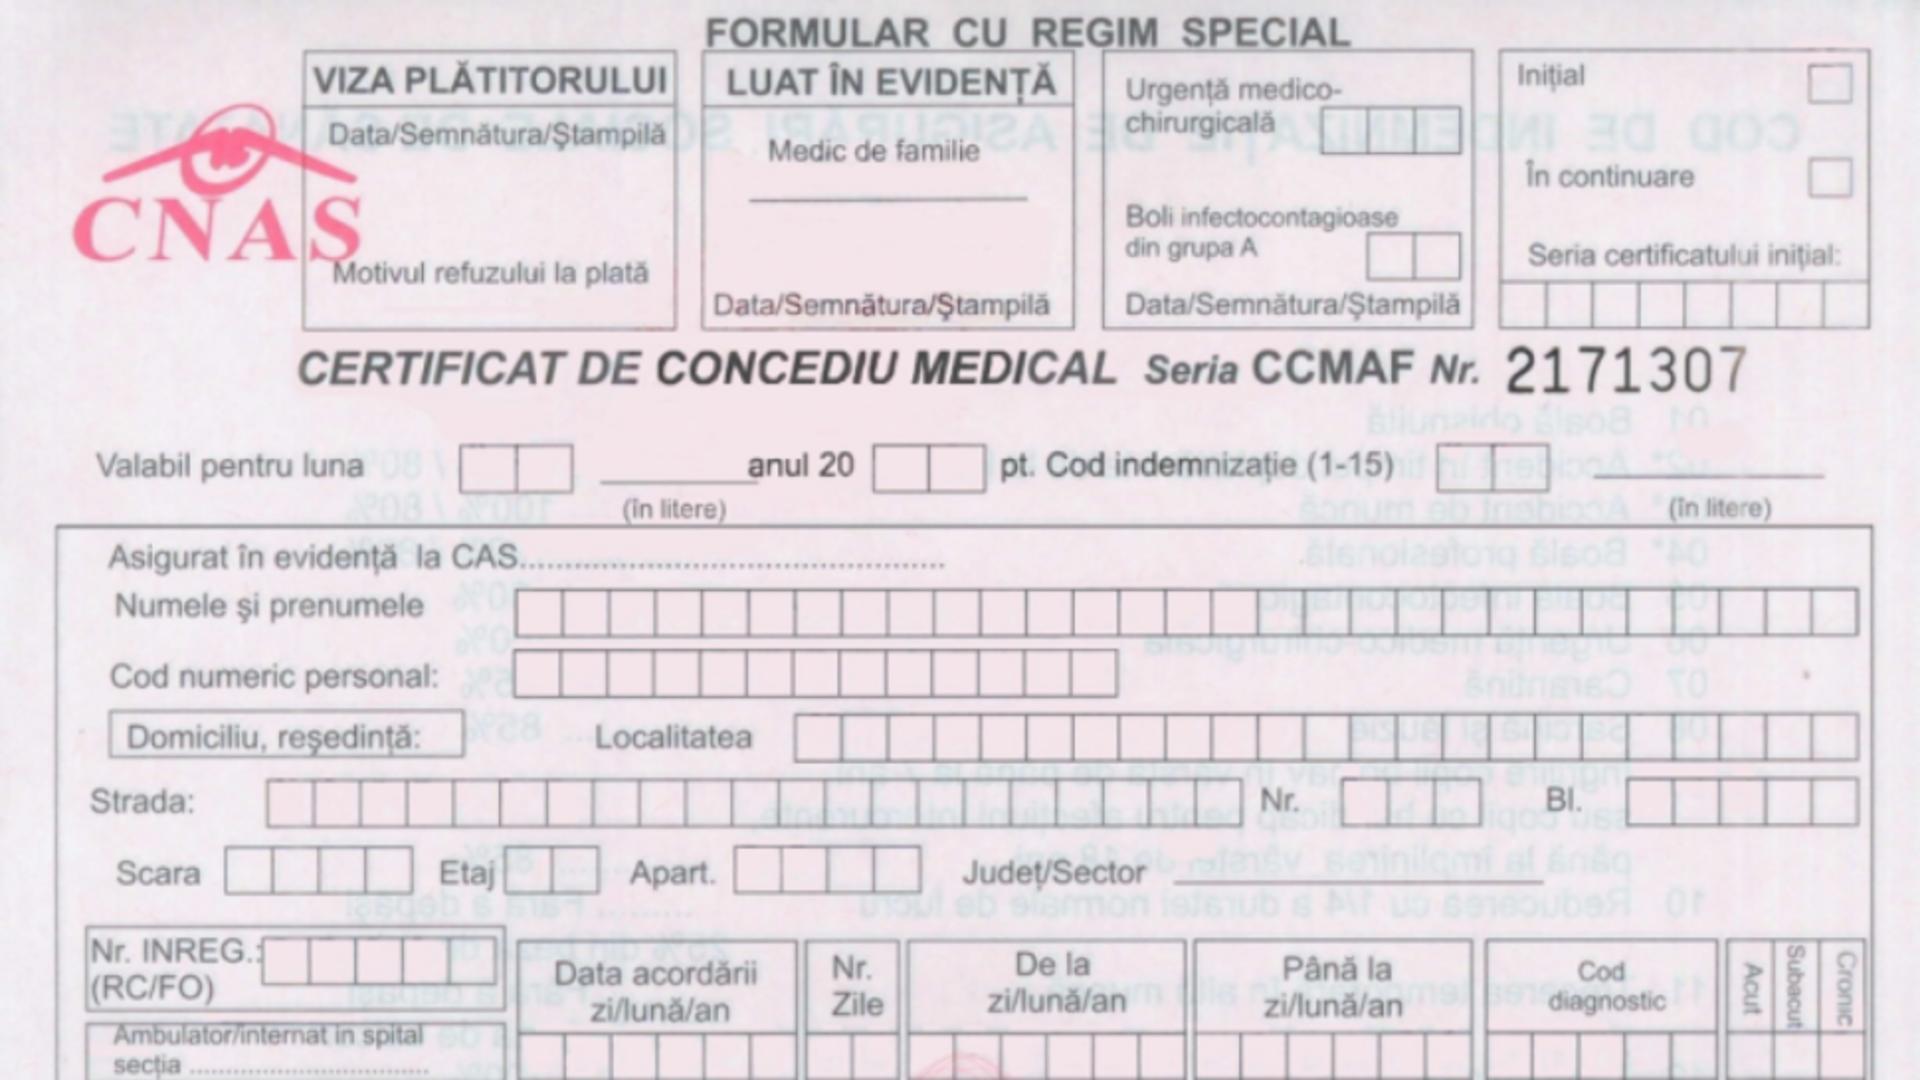 Formular concediu medical